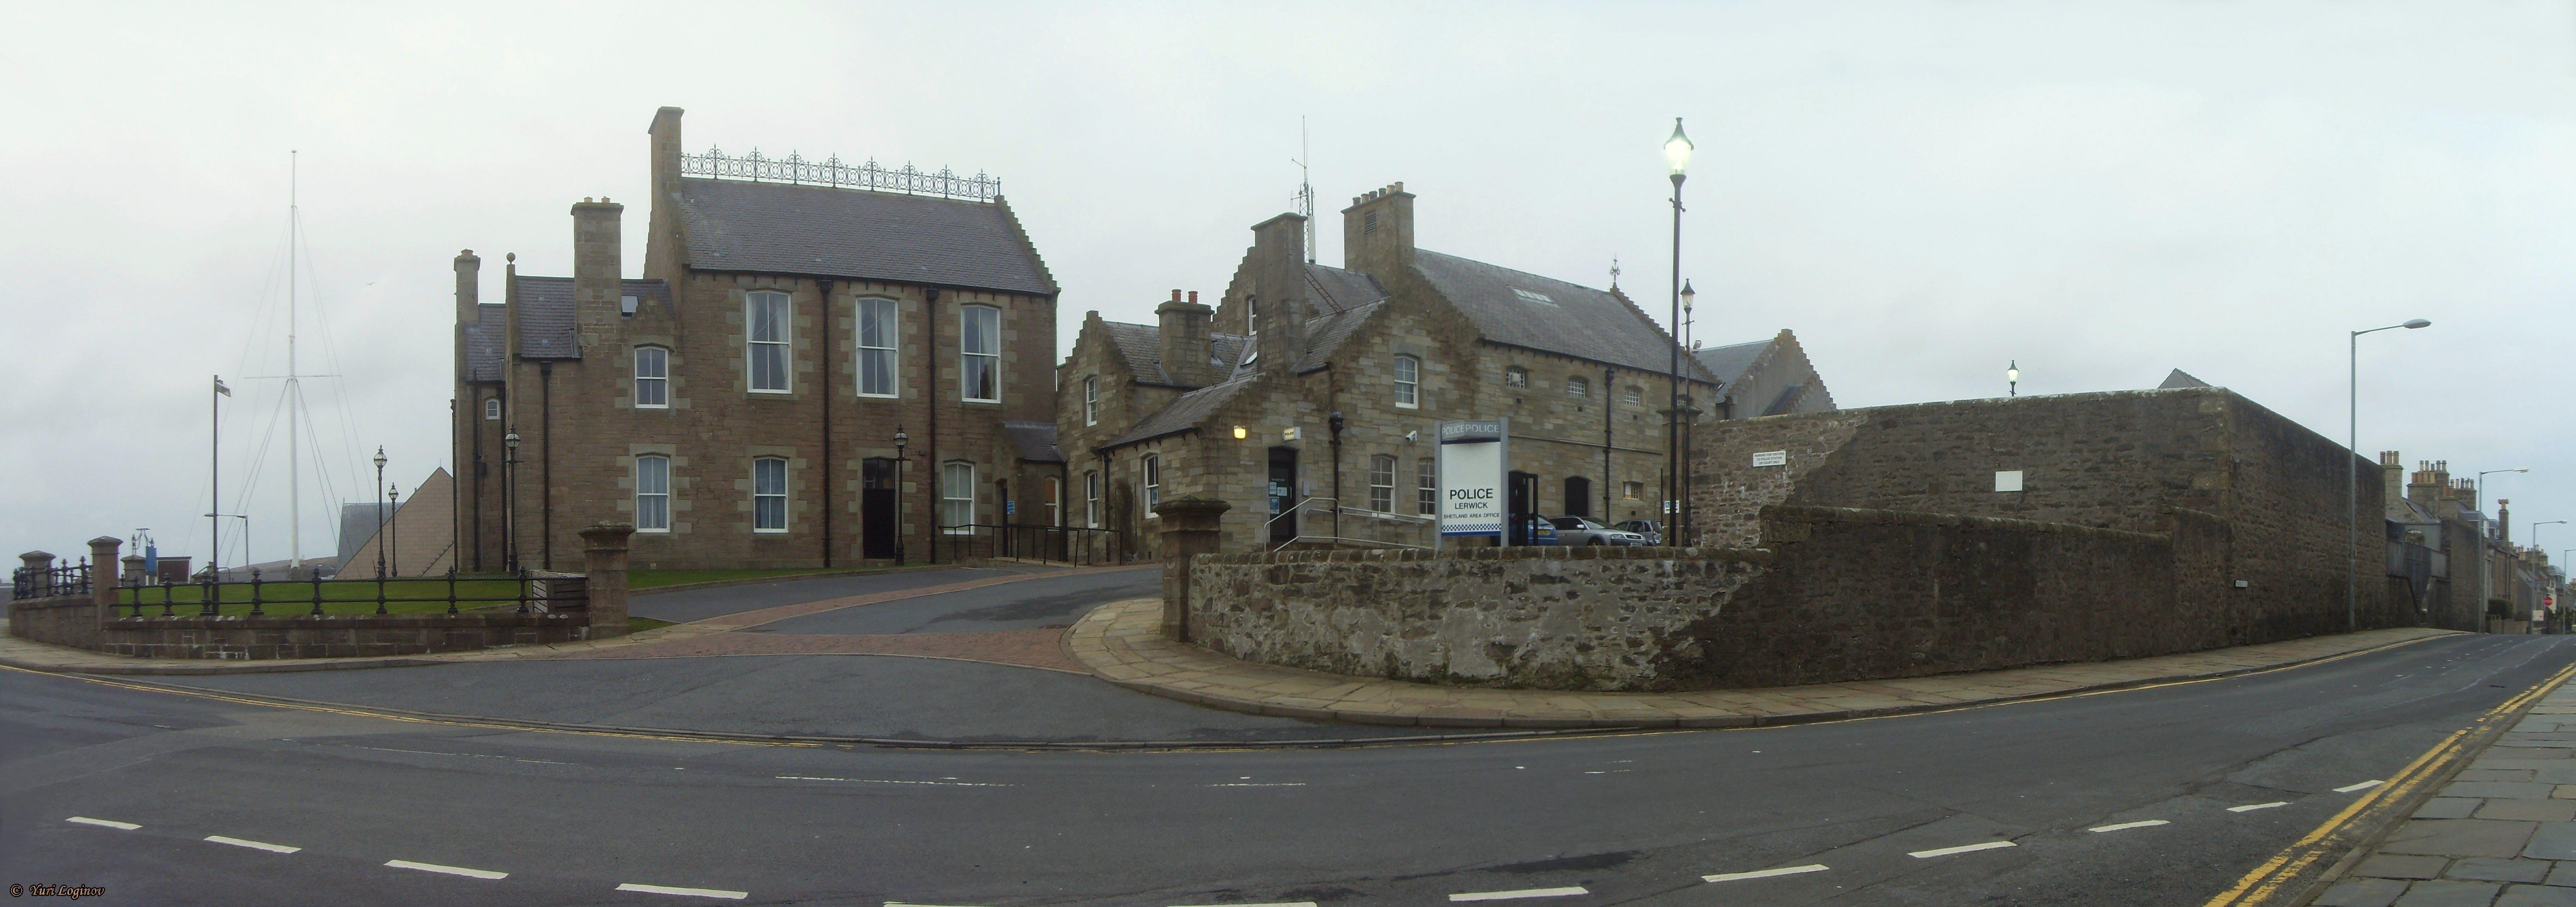 Free stock photo of Lerwick, Lerwick Police Station, scotland, Shetland